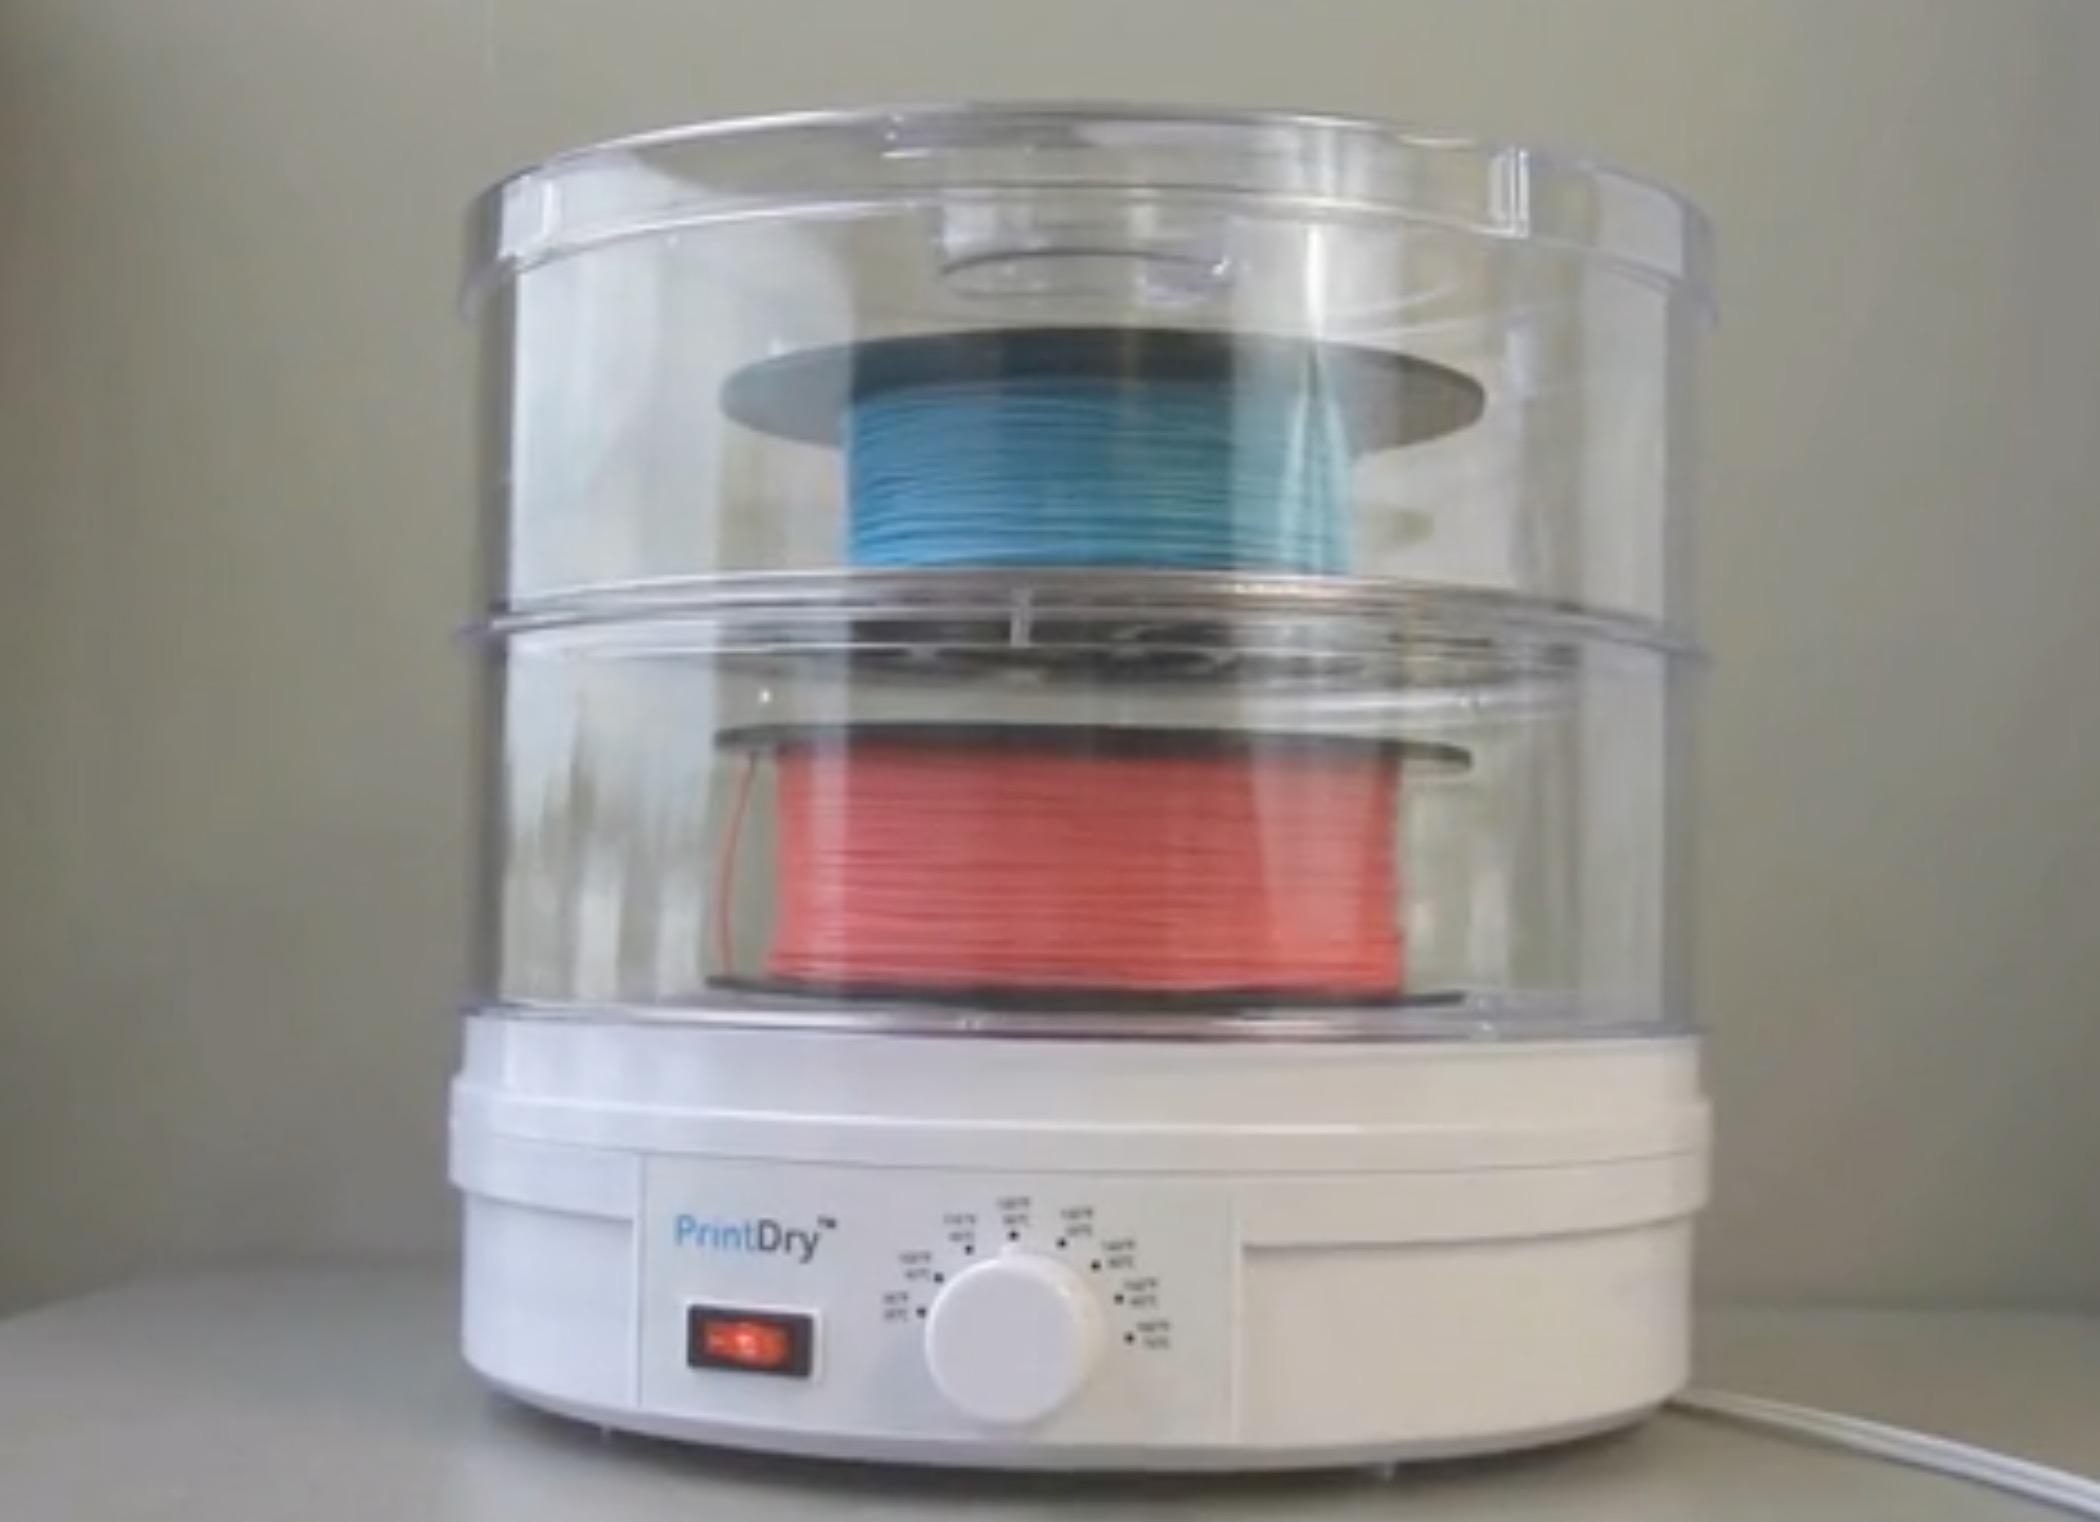 The PrintDry 3D printer filament quality system